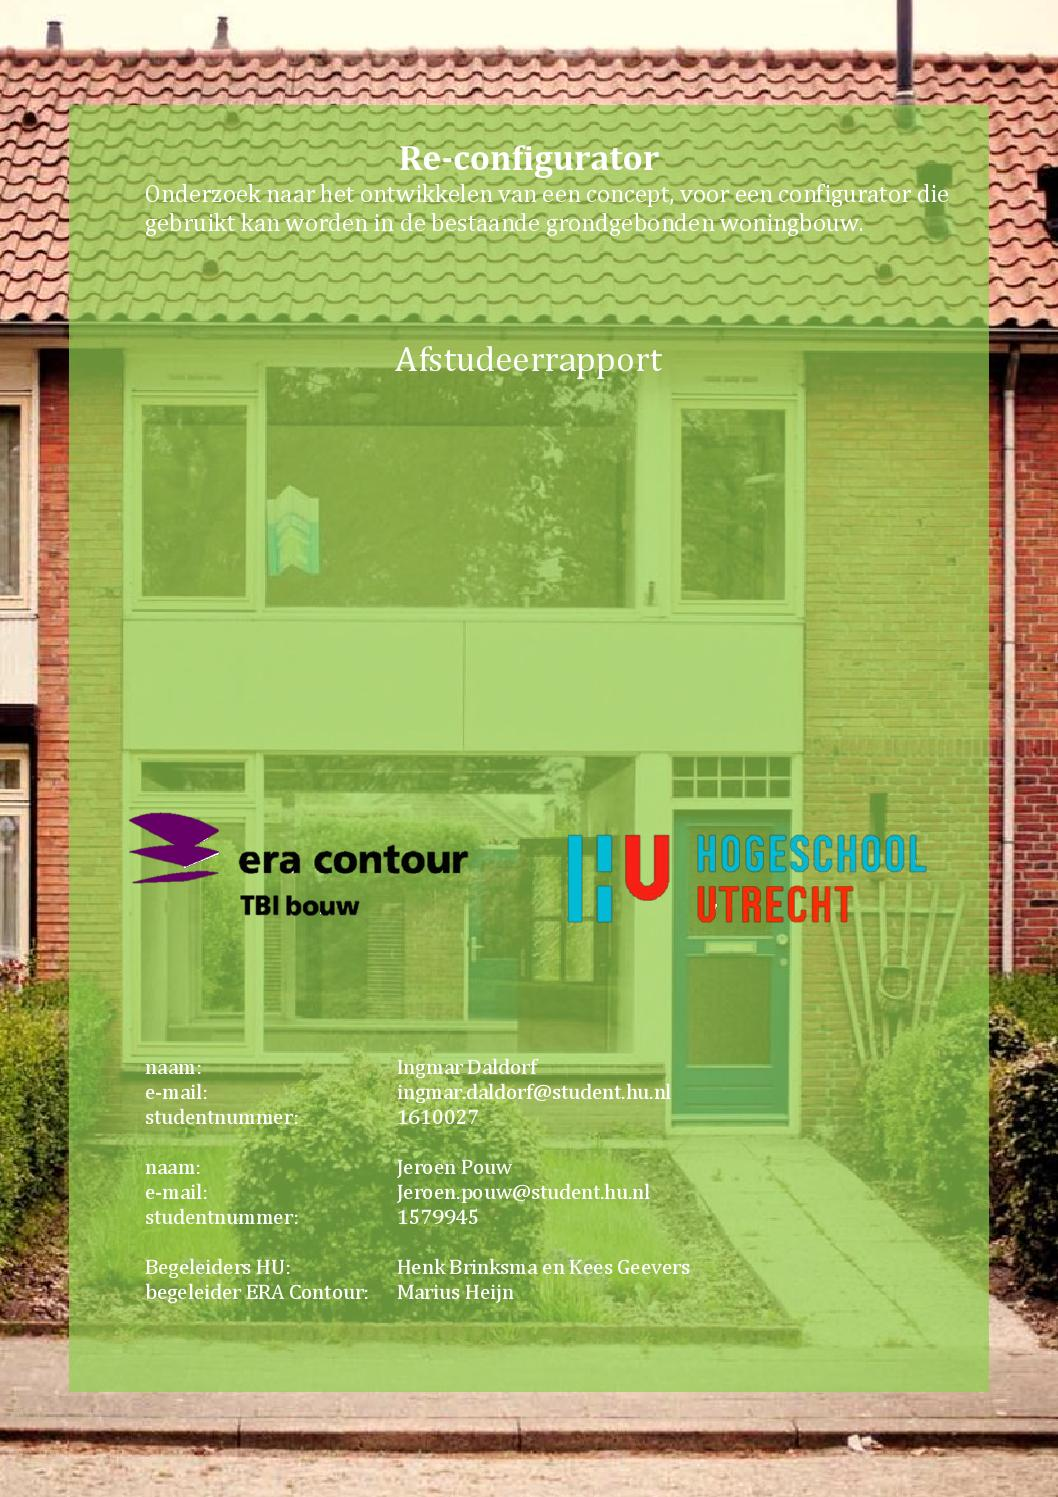 Re configurator afstudeerrapport by ingmar daldorf   issuu